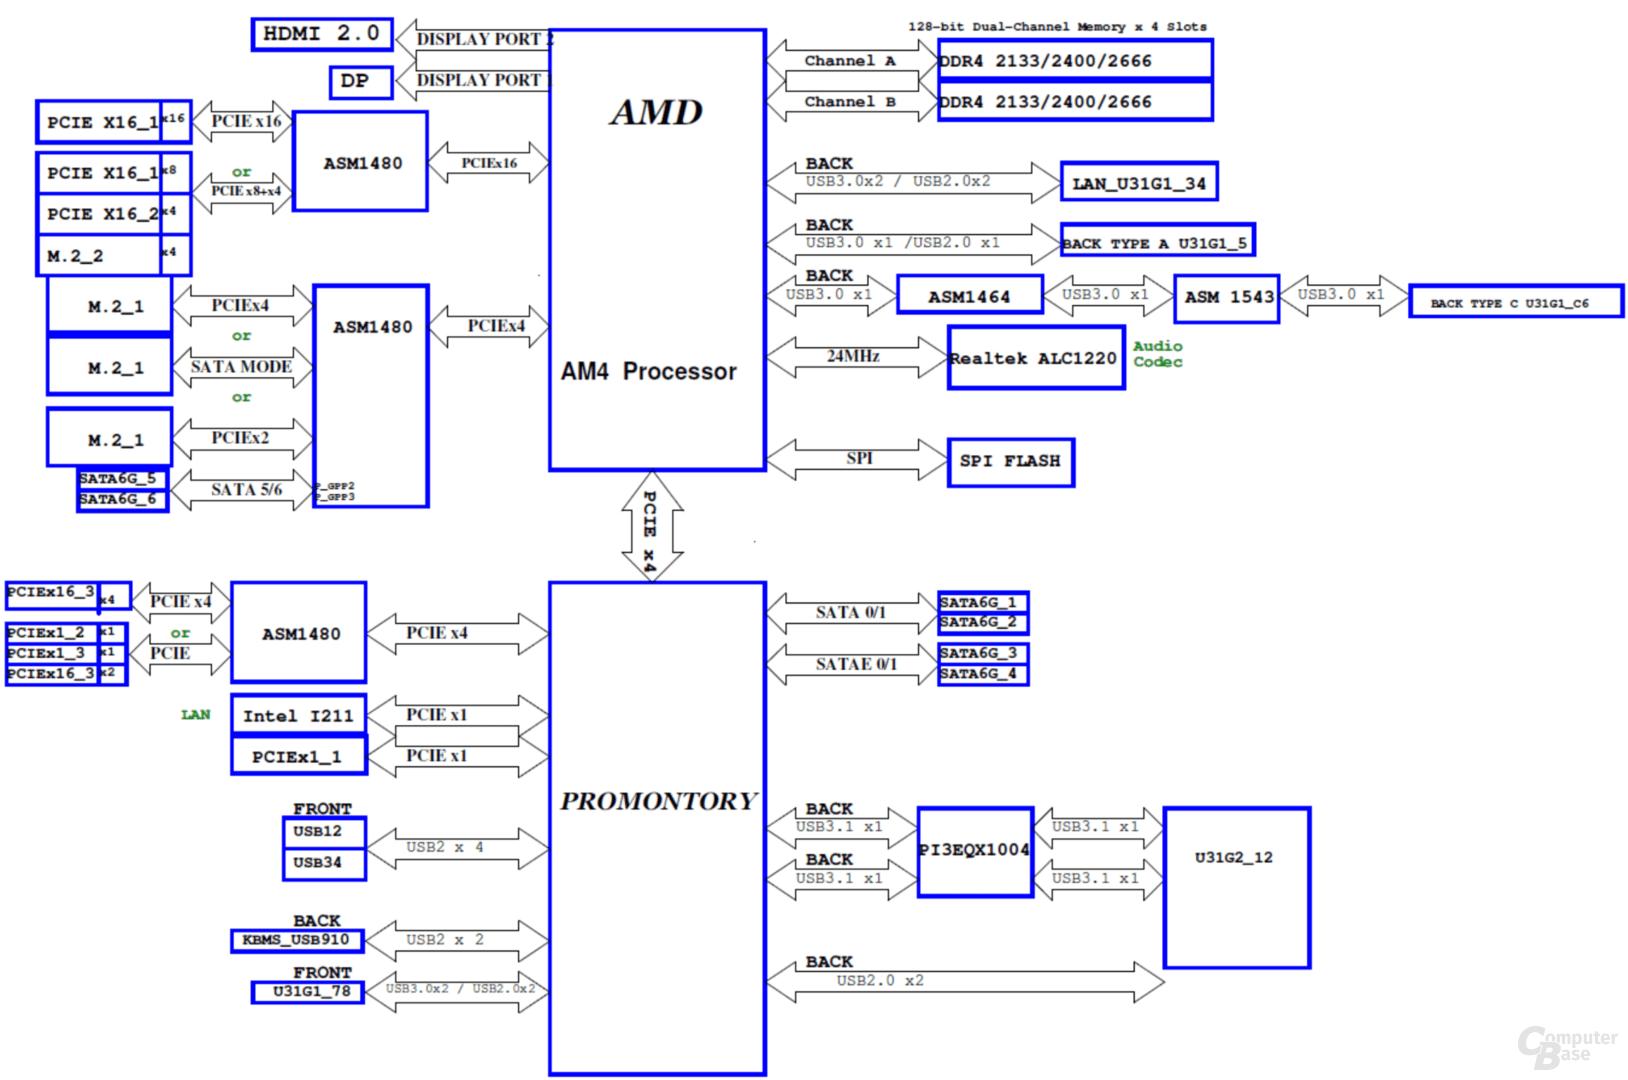 Blockdiagramm des Asus ROG Strix B450-F Gaming